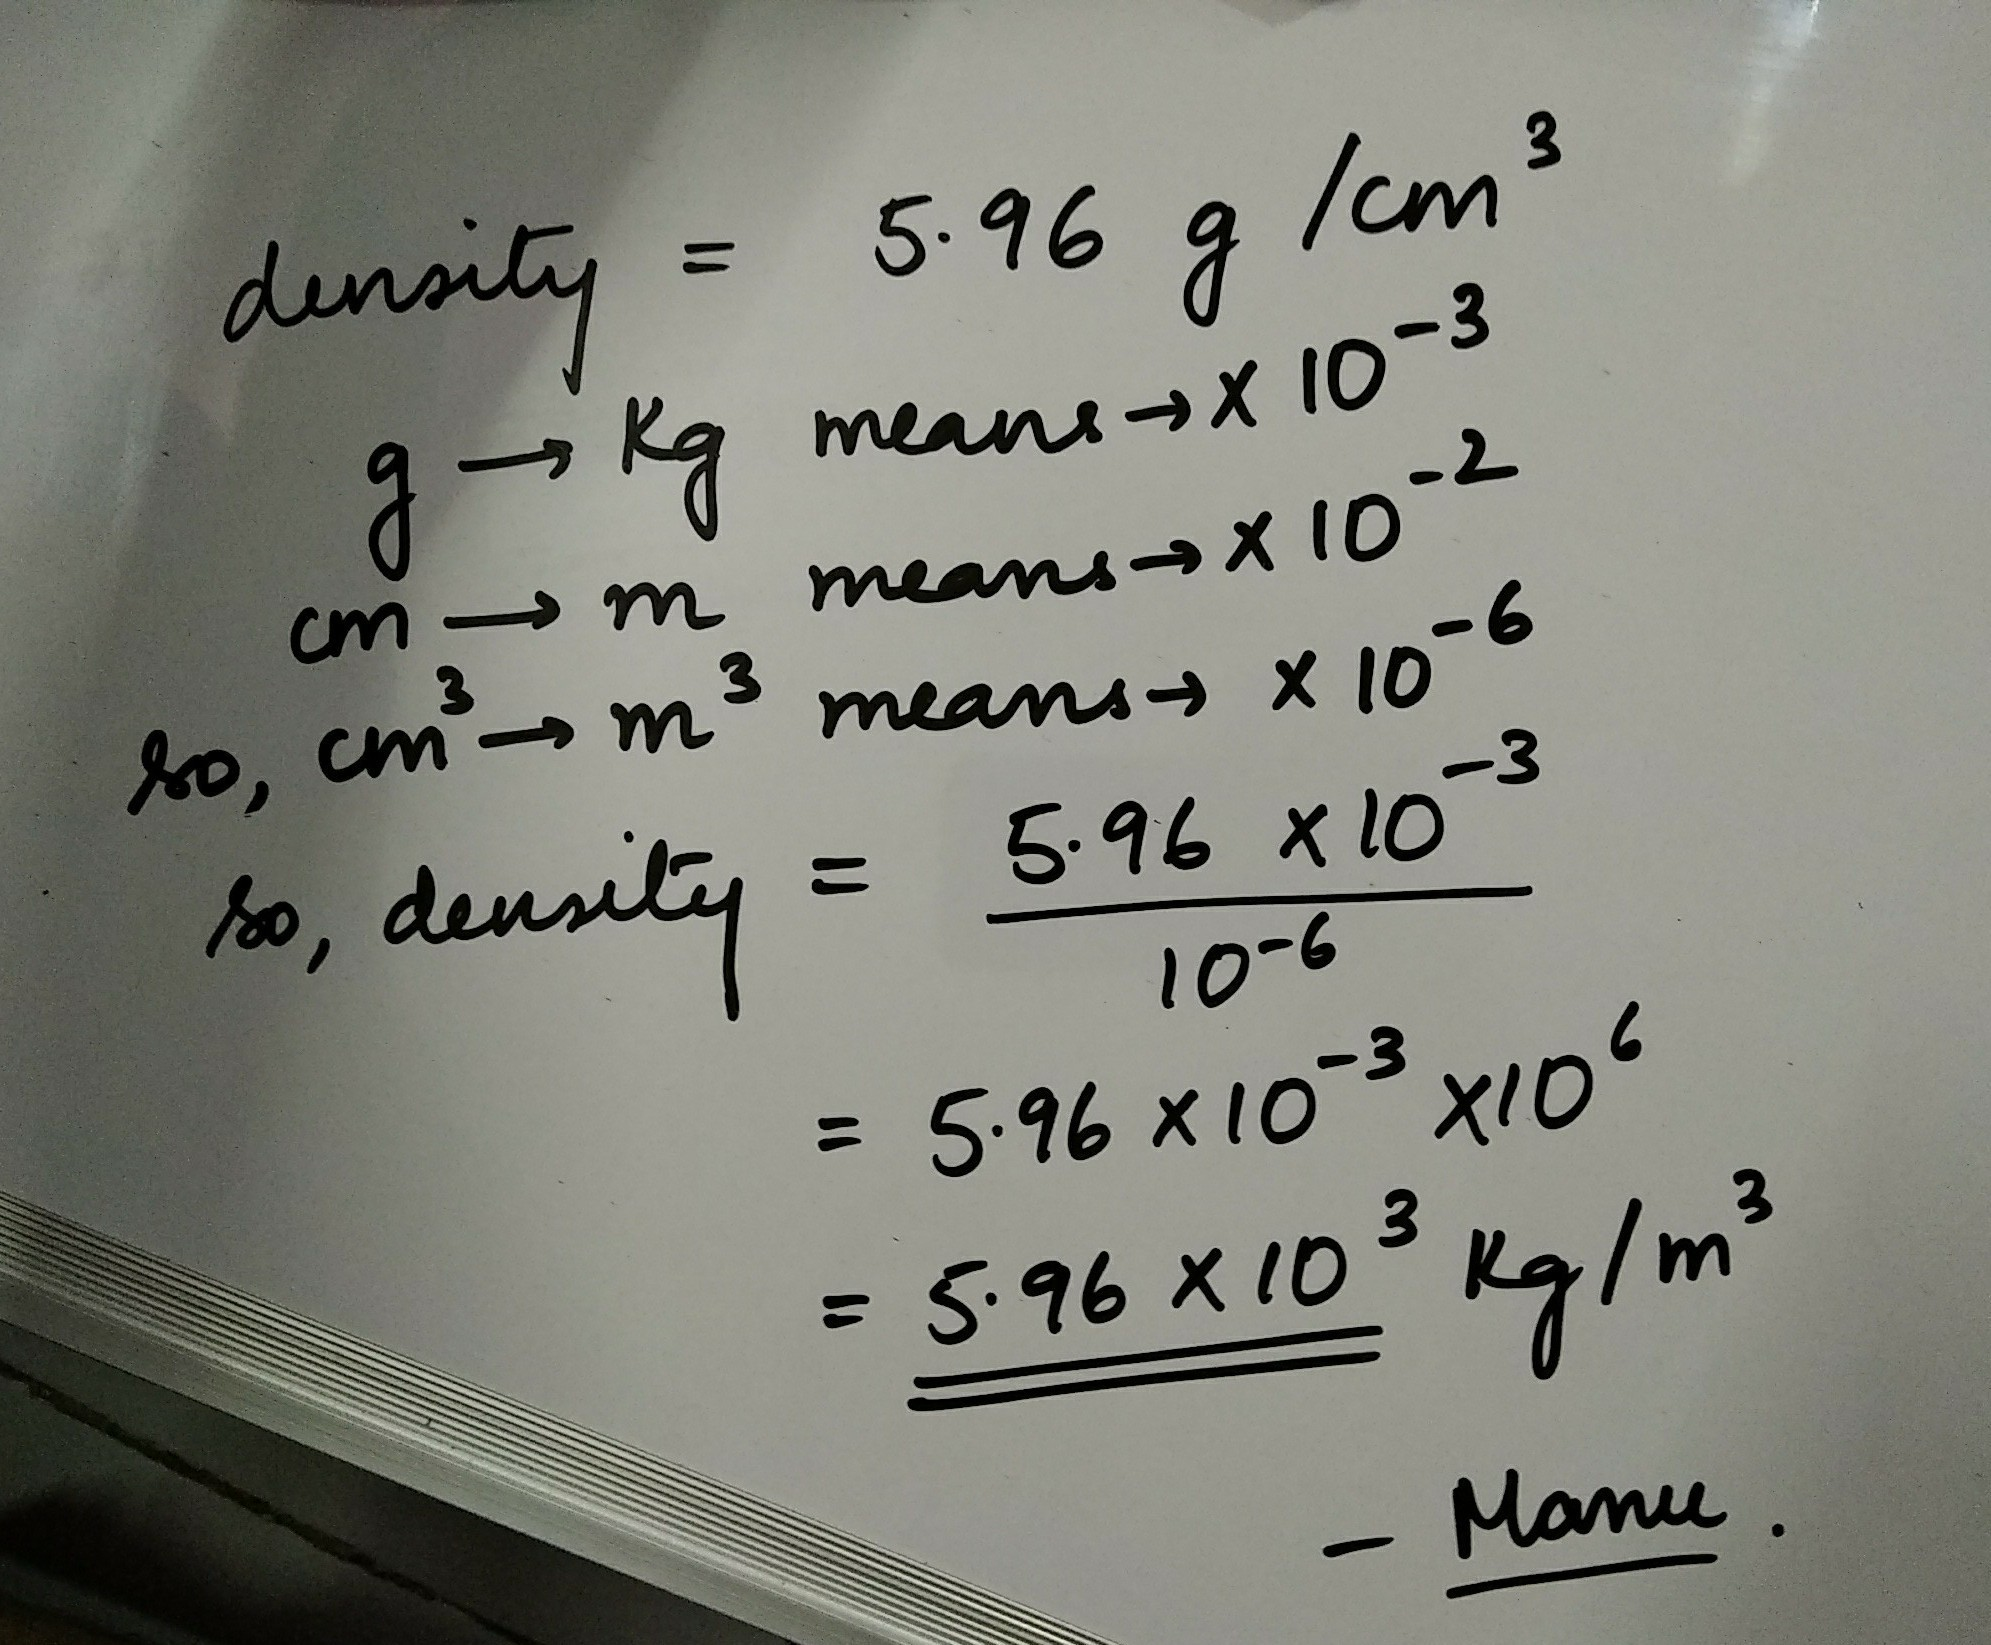 The density of vanadium is 5.96g/cm3 convert the density ...